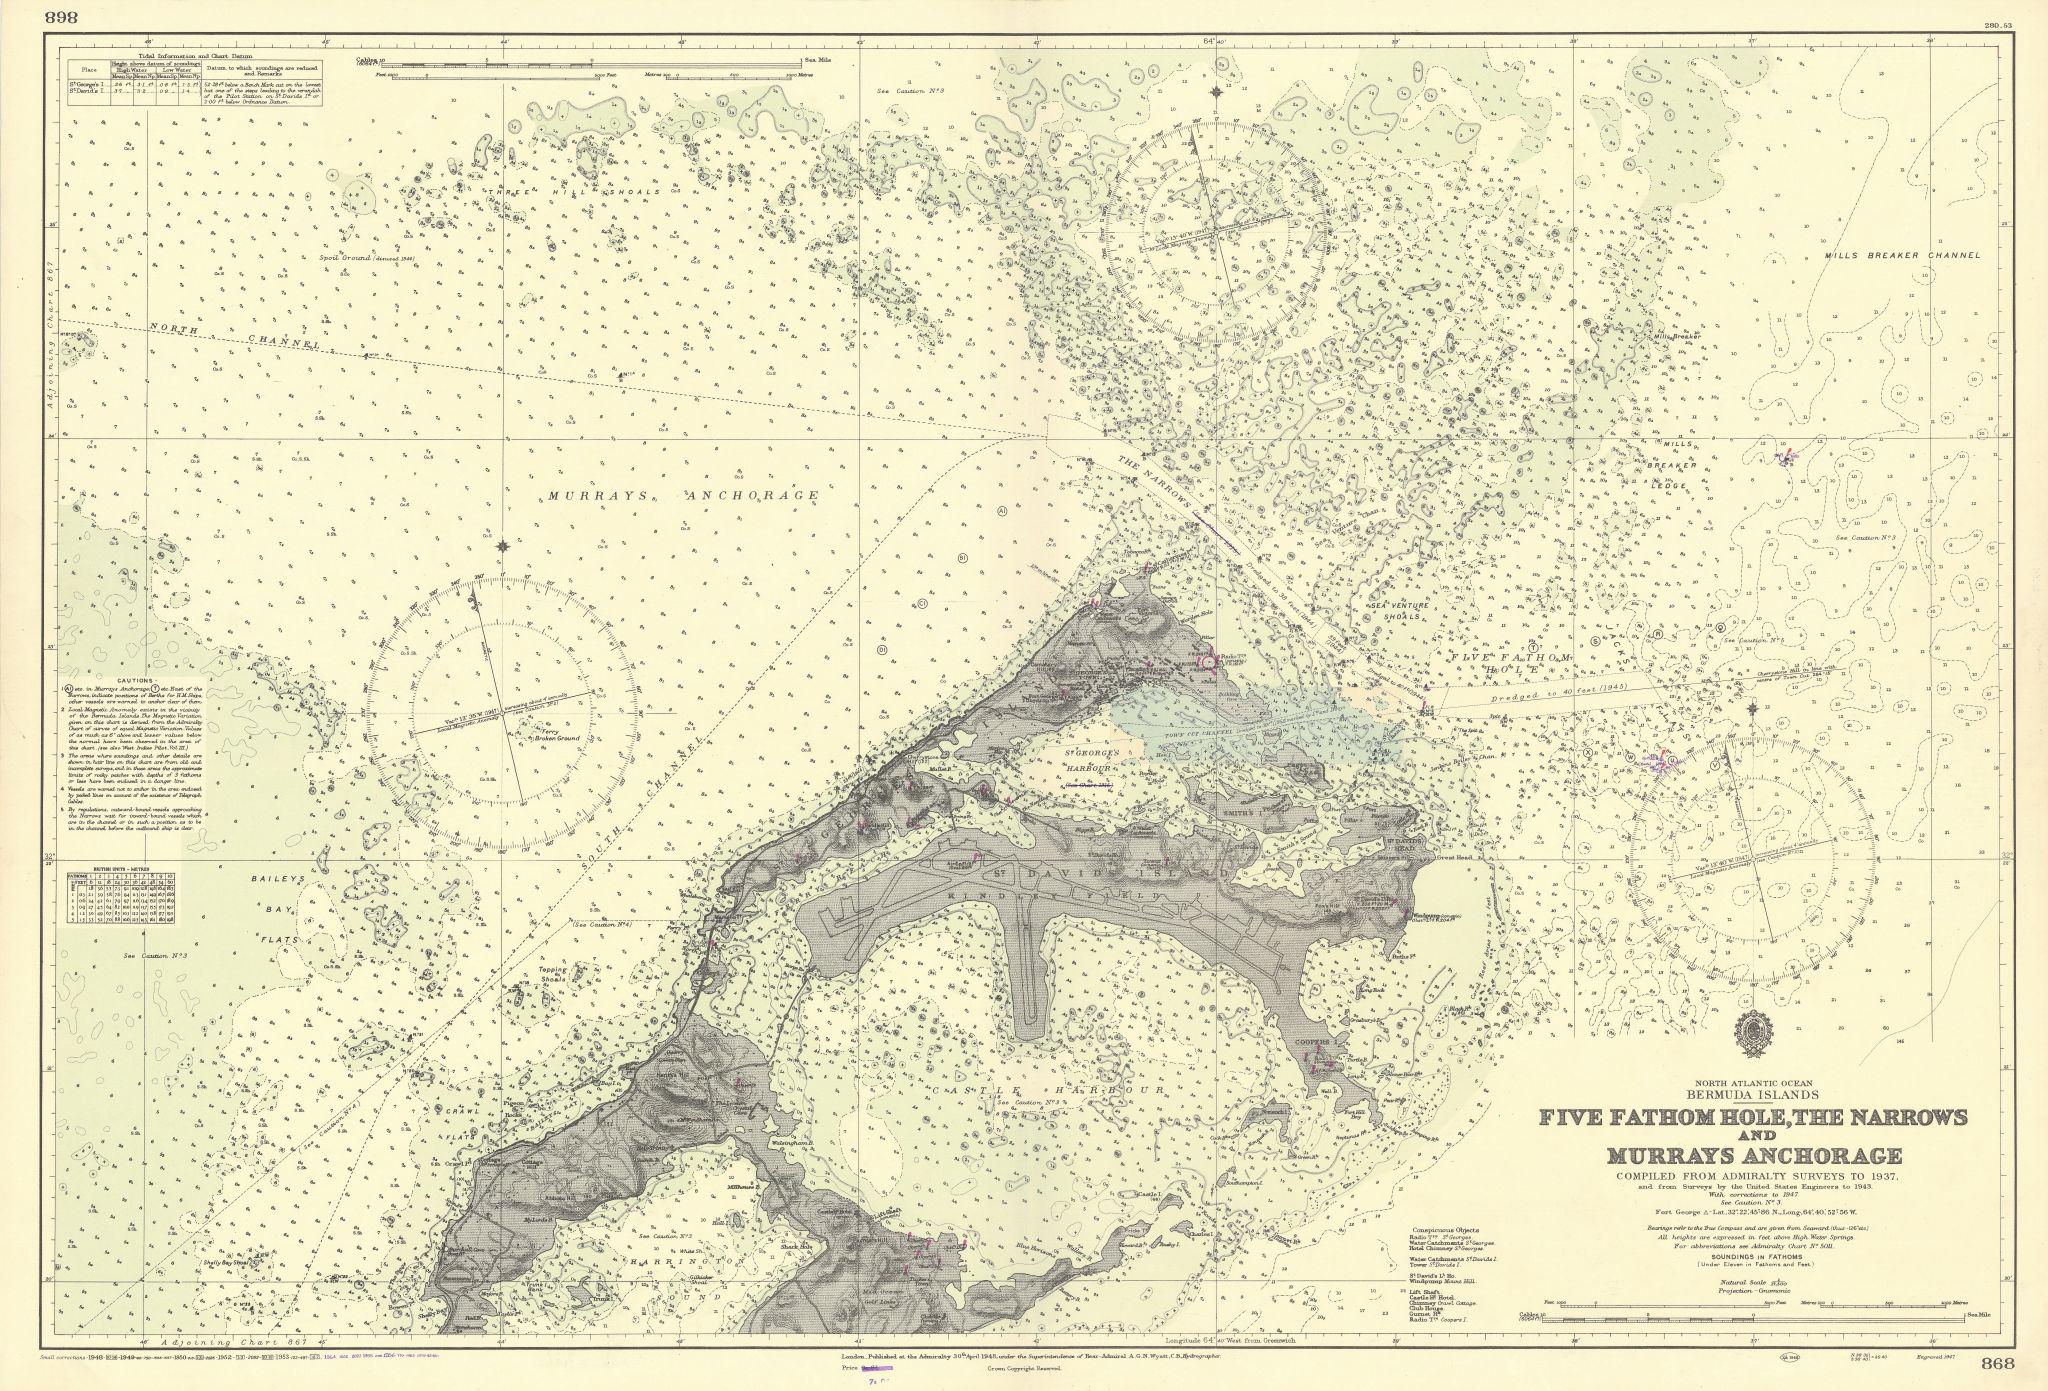 Bermuda 5 Fathom Hole Narrows Murrays Anchorage ADMIRALTY chart 1948 (1956) map